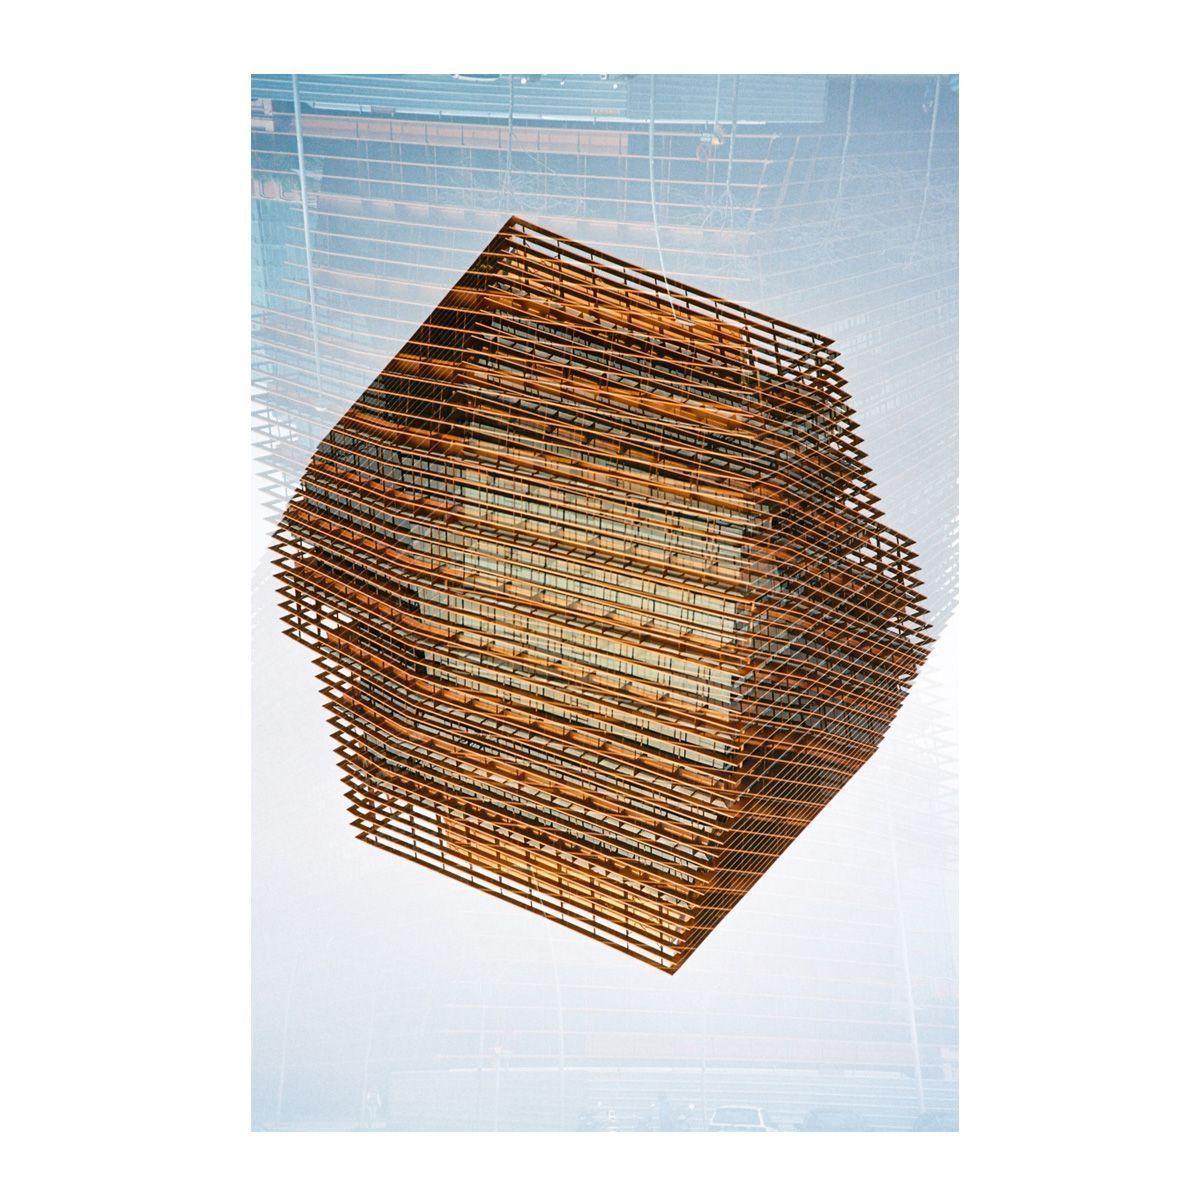 PRE-FORM - Arnau Rovira-01-web